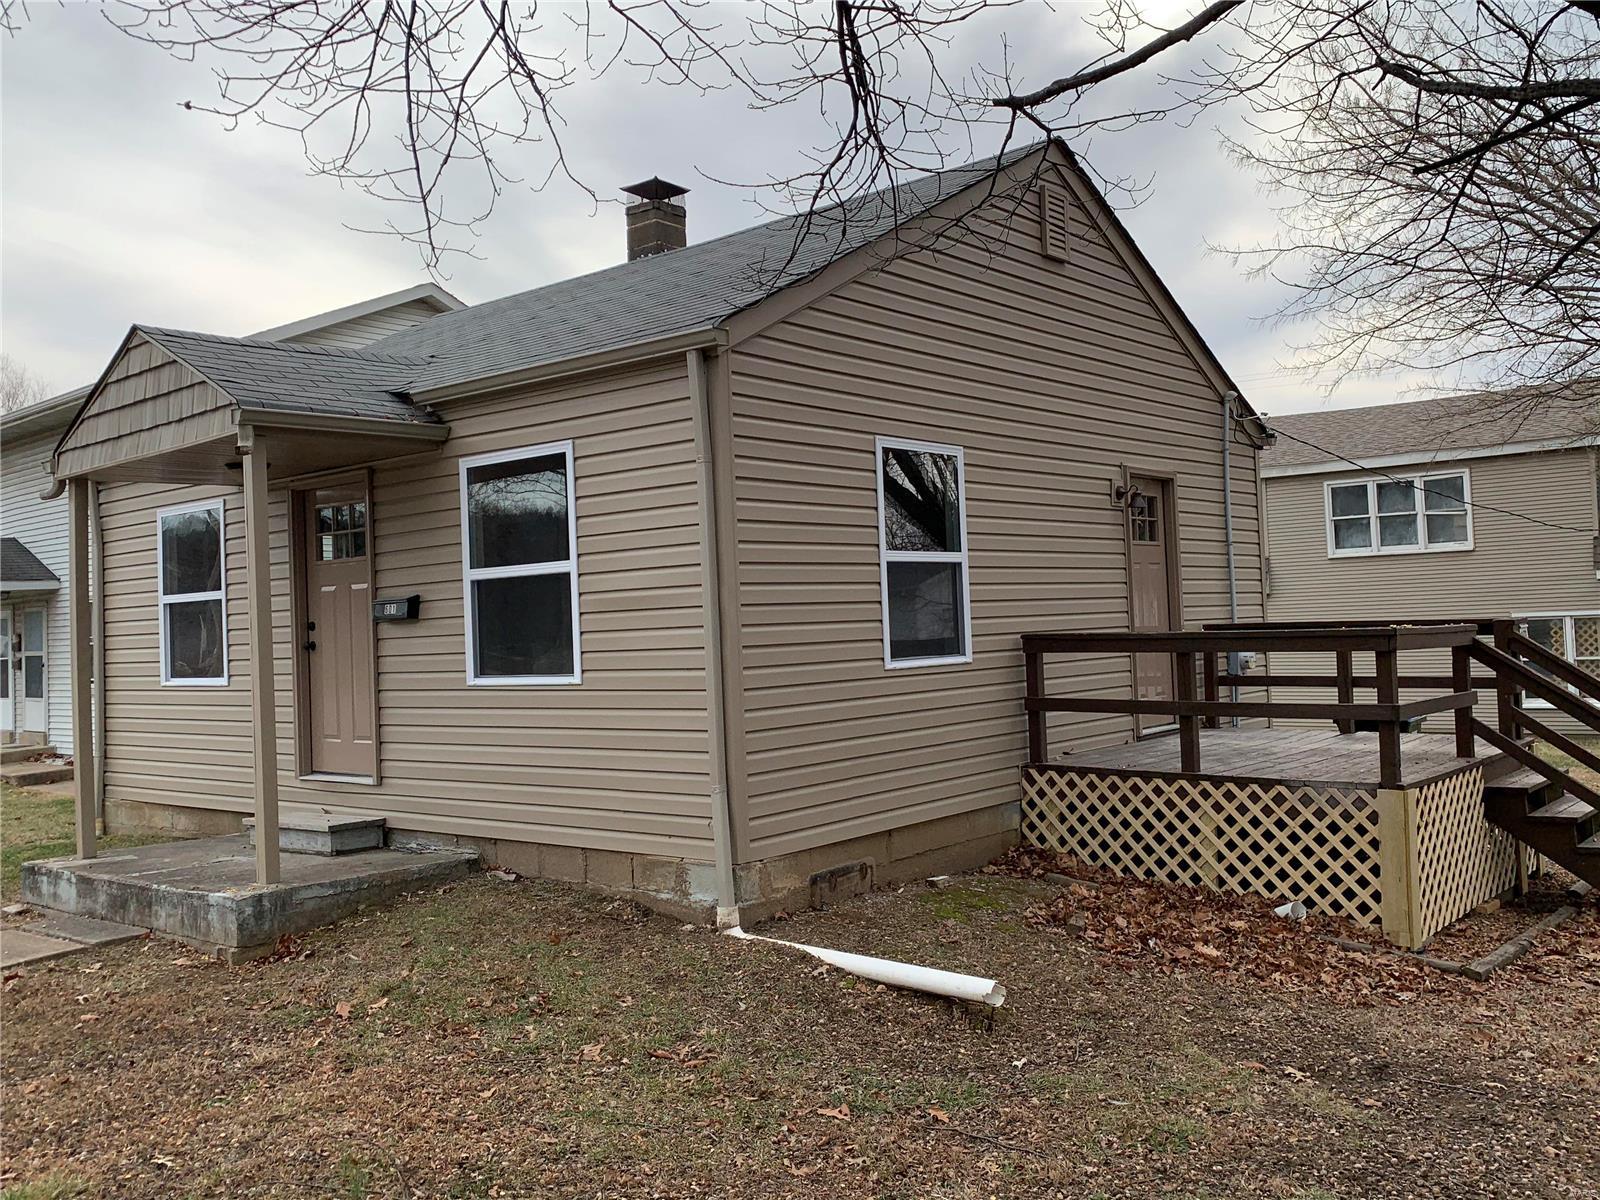 601 S. Main Property Photo - Dupo, IL real estate listing